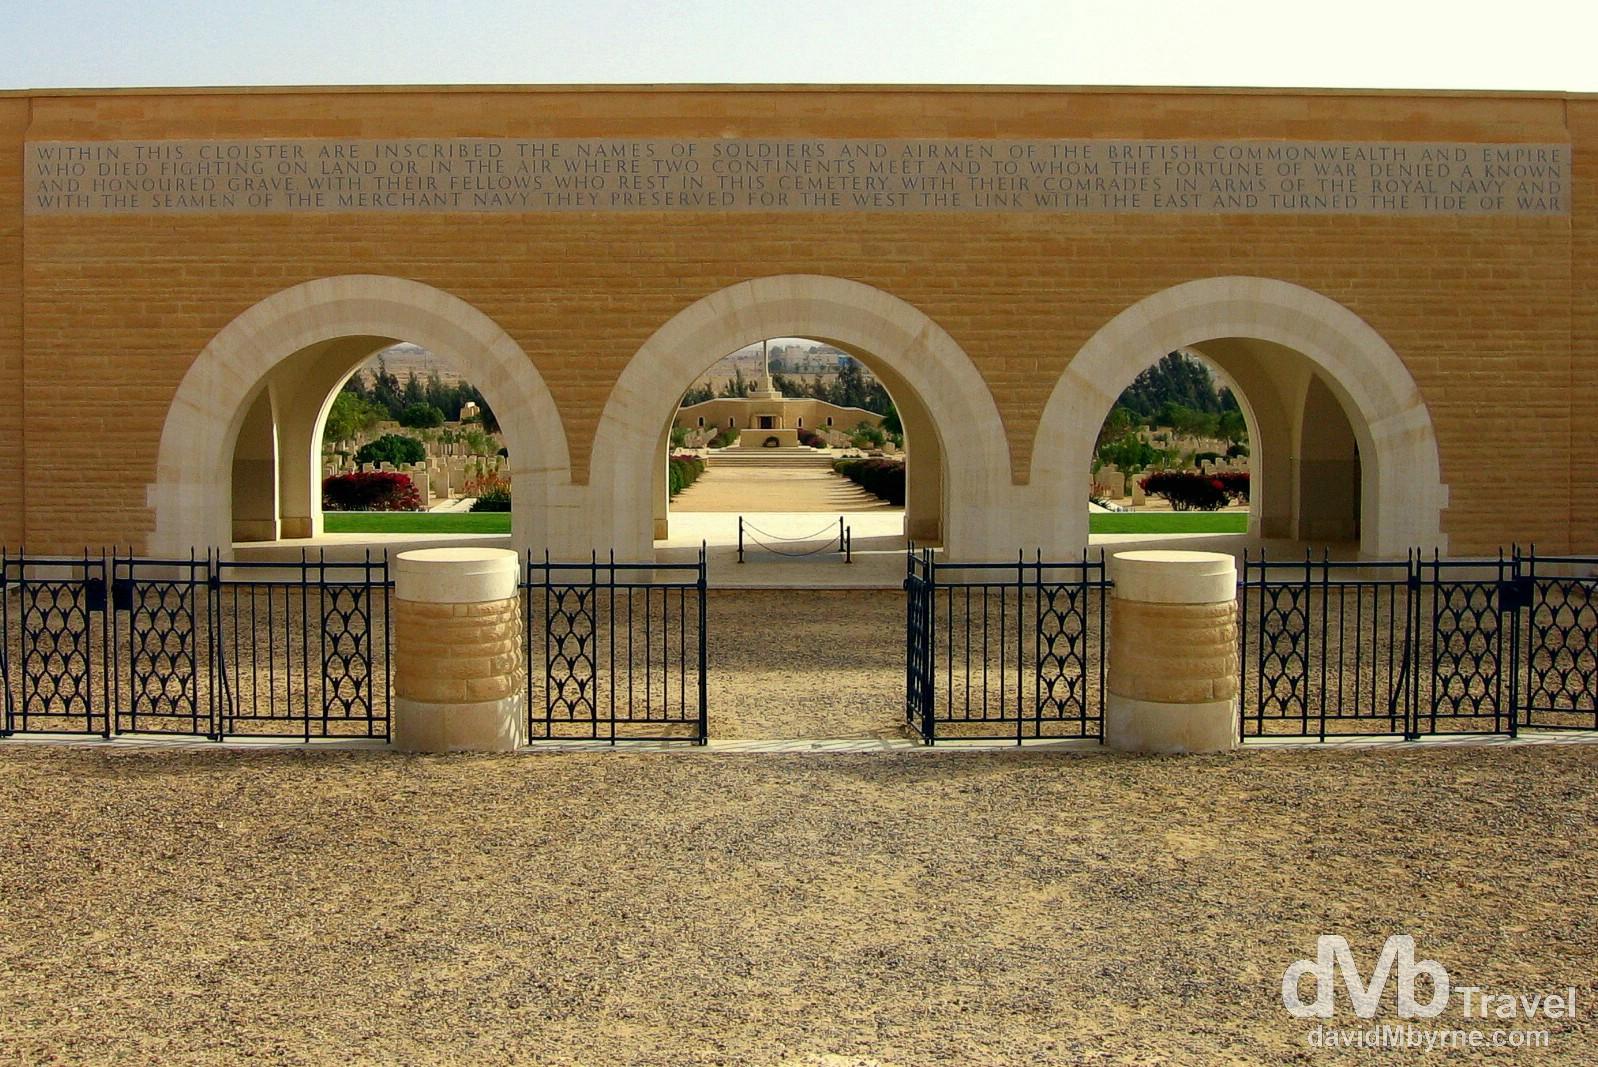 Allied War Cemetery, El-Alamein, Egypt. April 15, 2008.